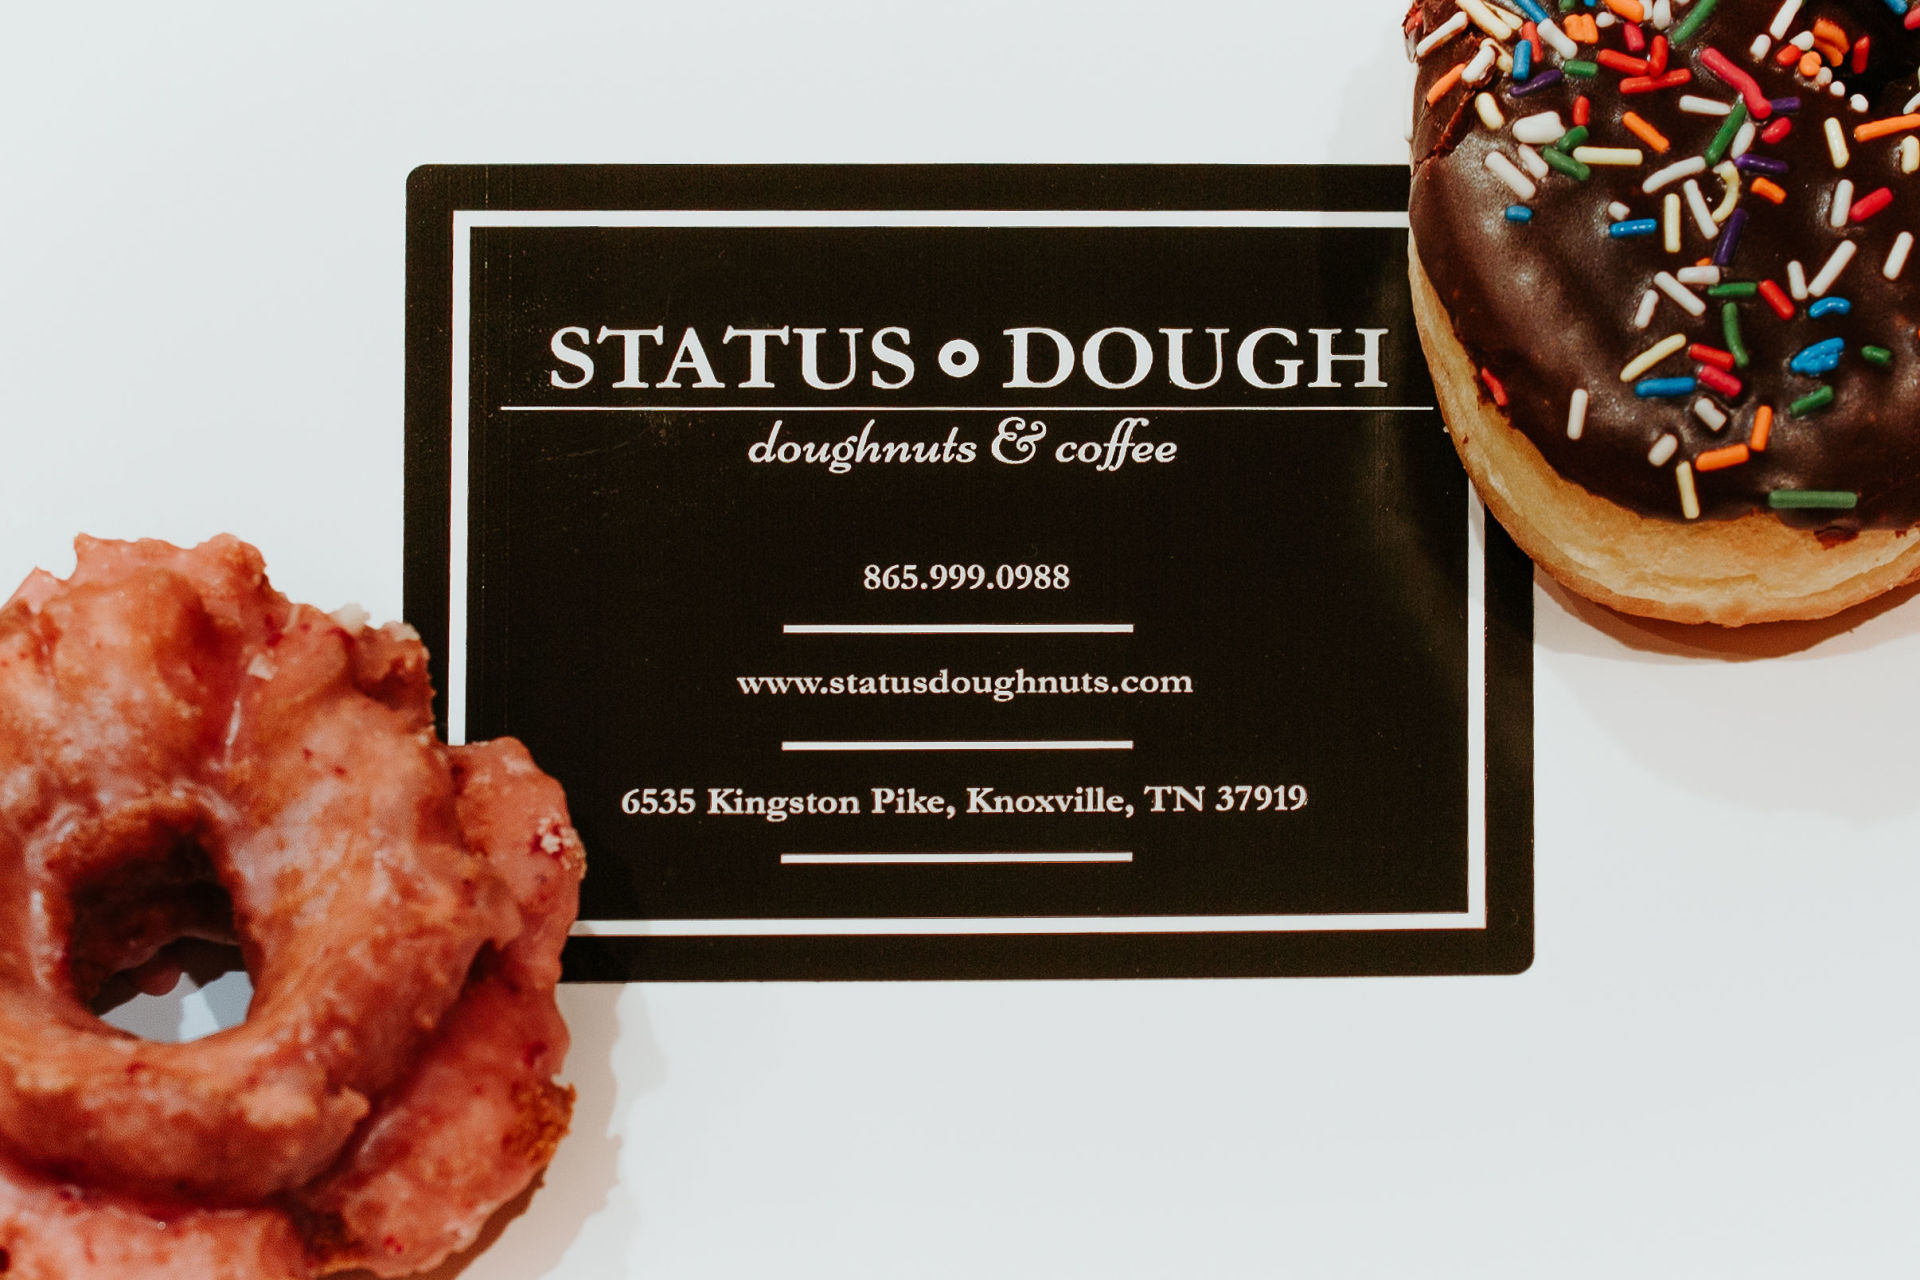 Status Dough